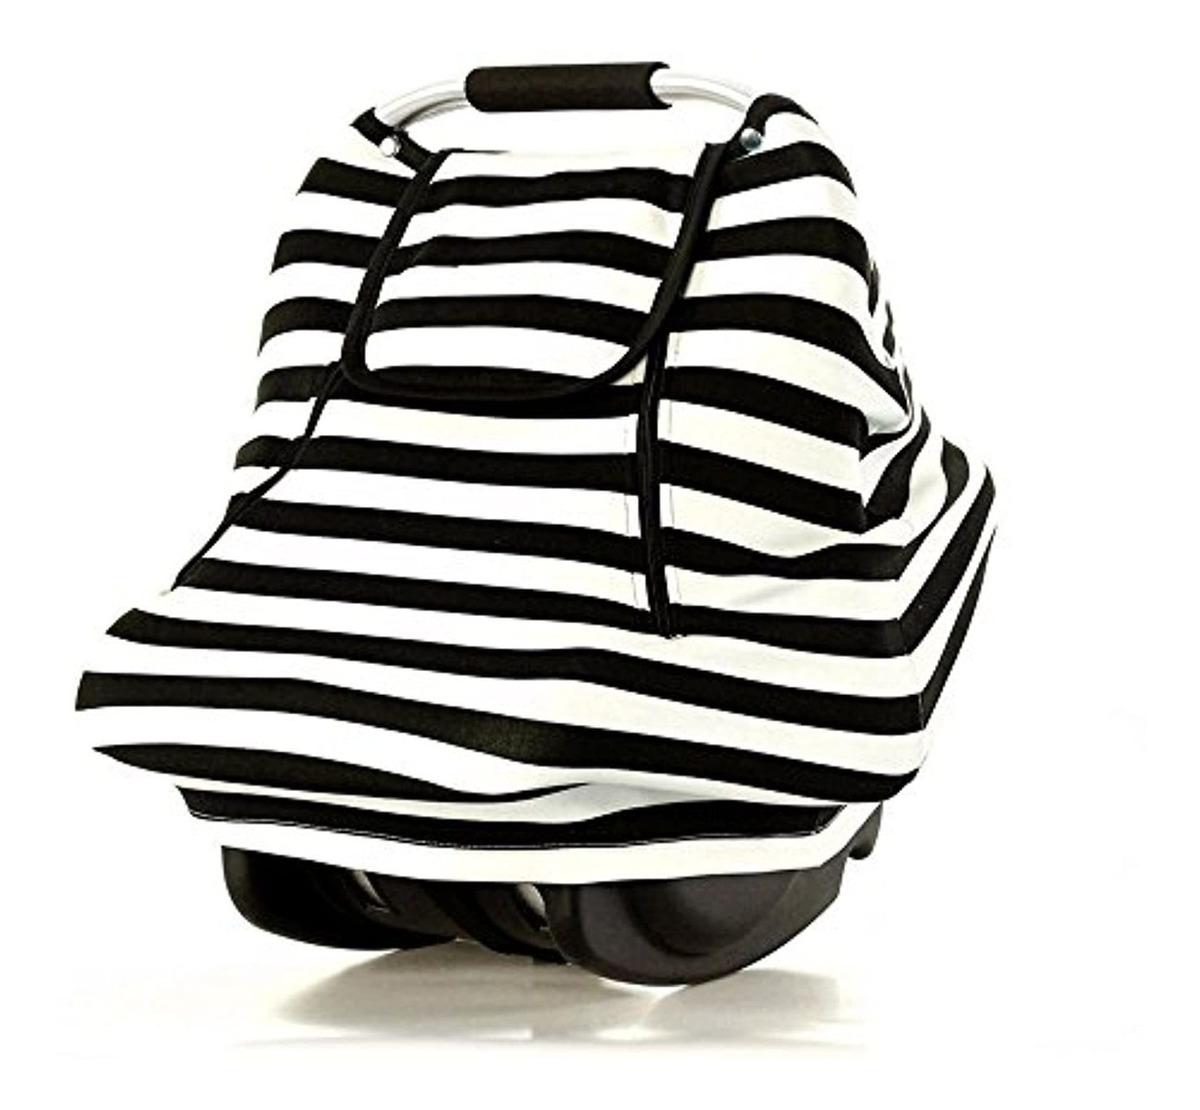 Picture of: Acrabros Stretchy Baby Car Seat Covers For 137 253 En Mercado Libre